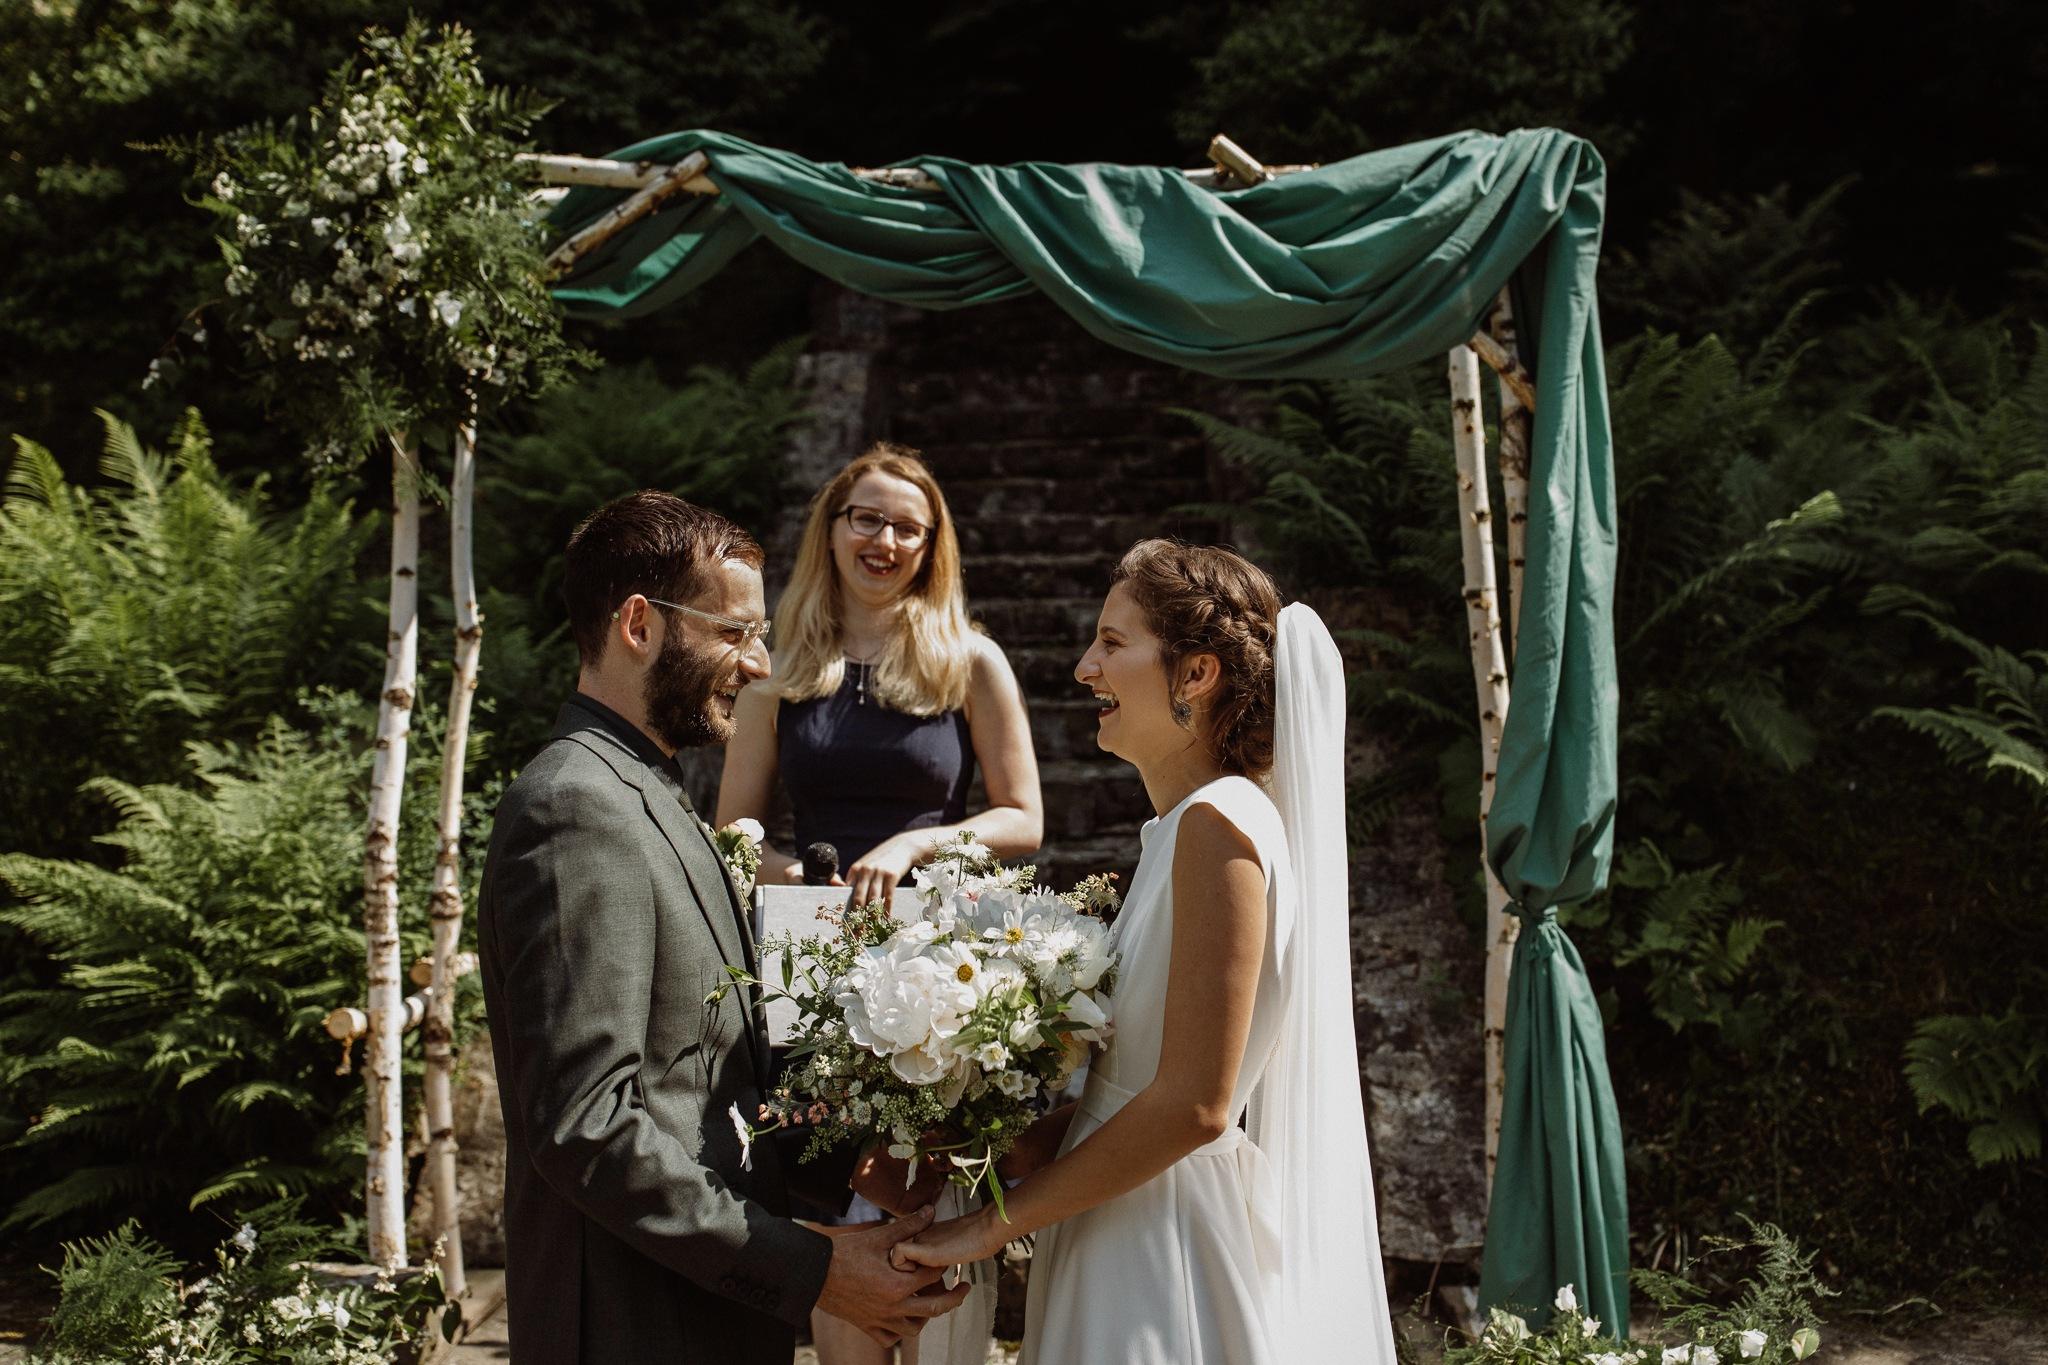 fot. Michal Ramus Weddings